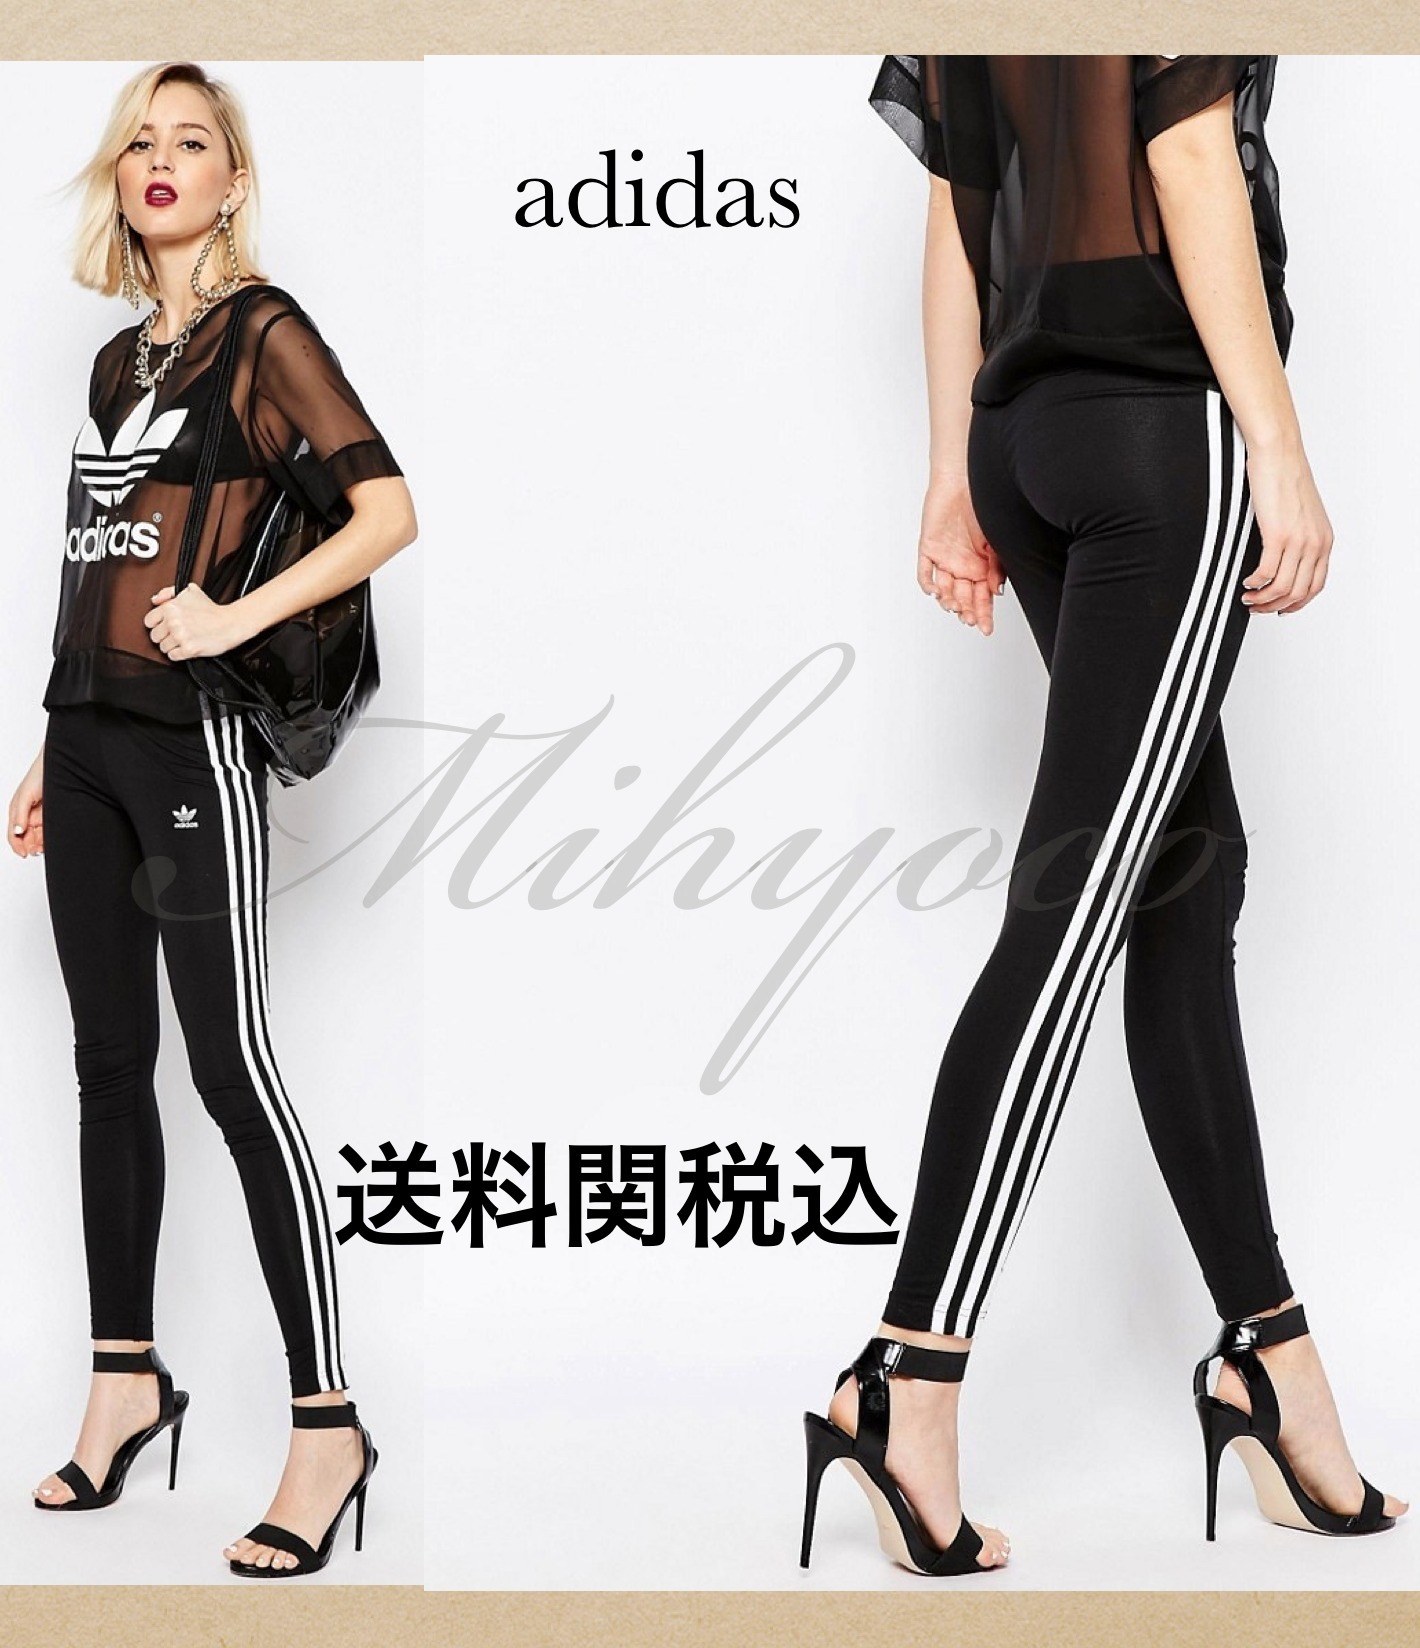 Adidas Originals アディカラー3ストライプ レギンススタイル写真